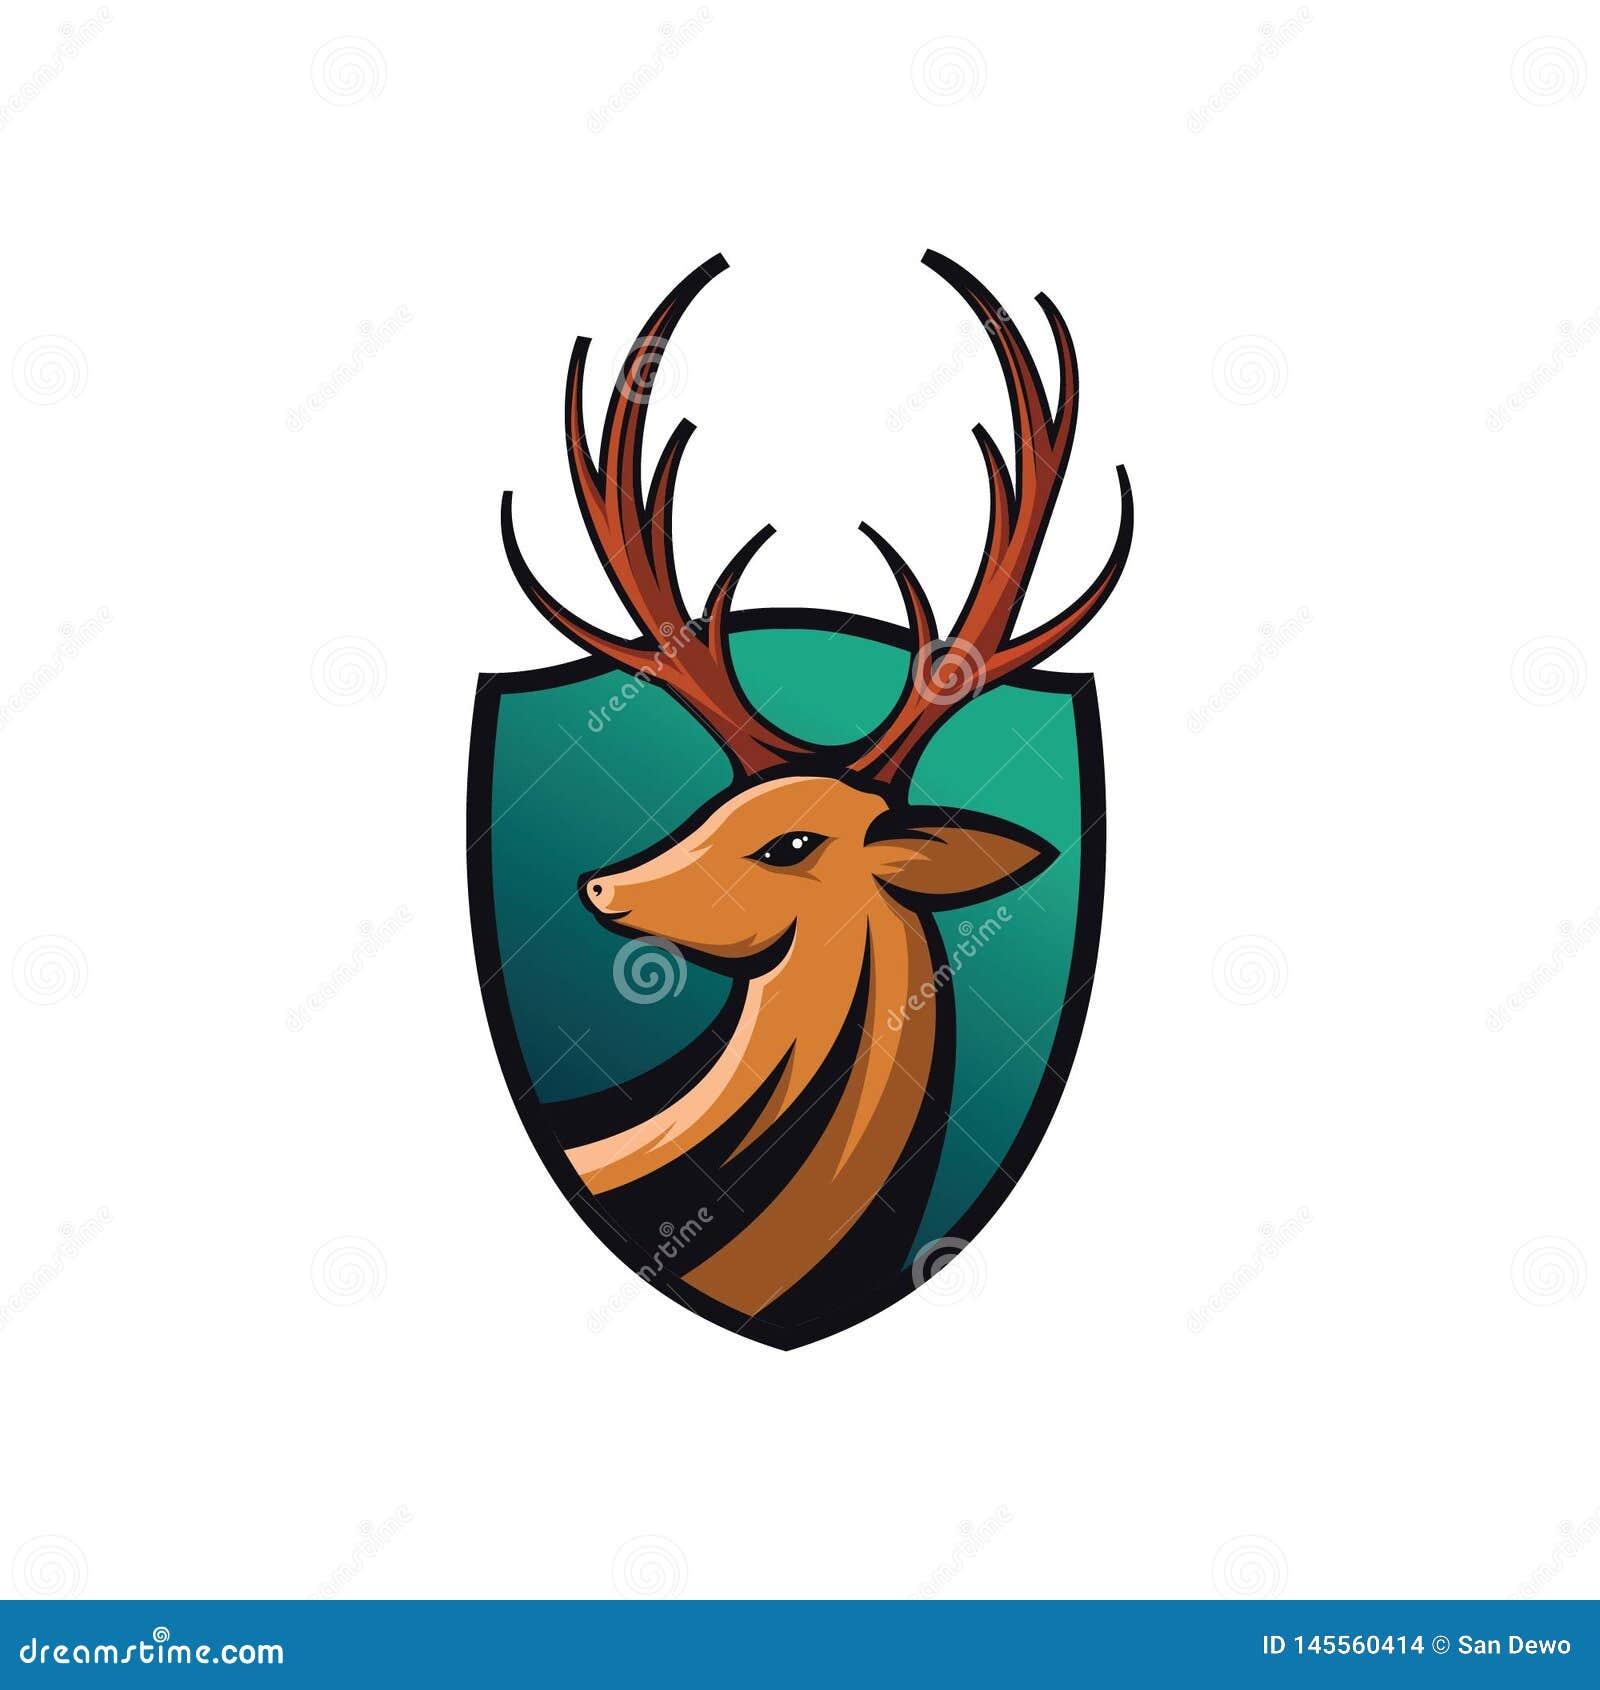 Illustration of deer shields